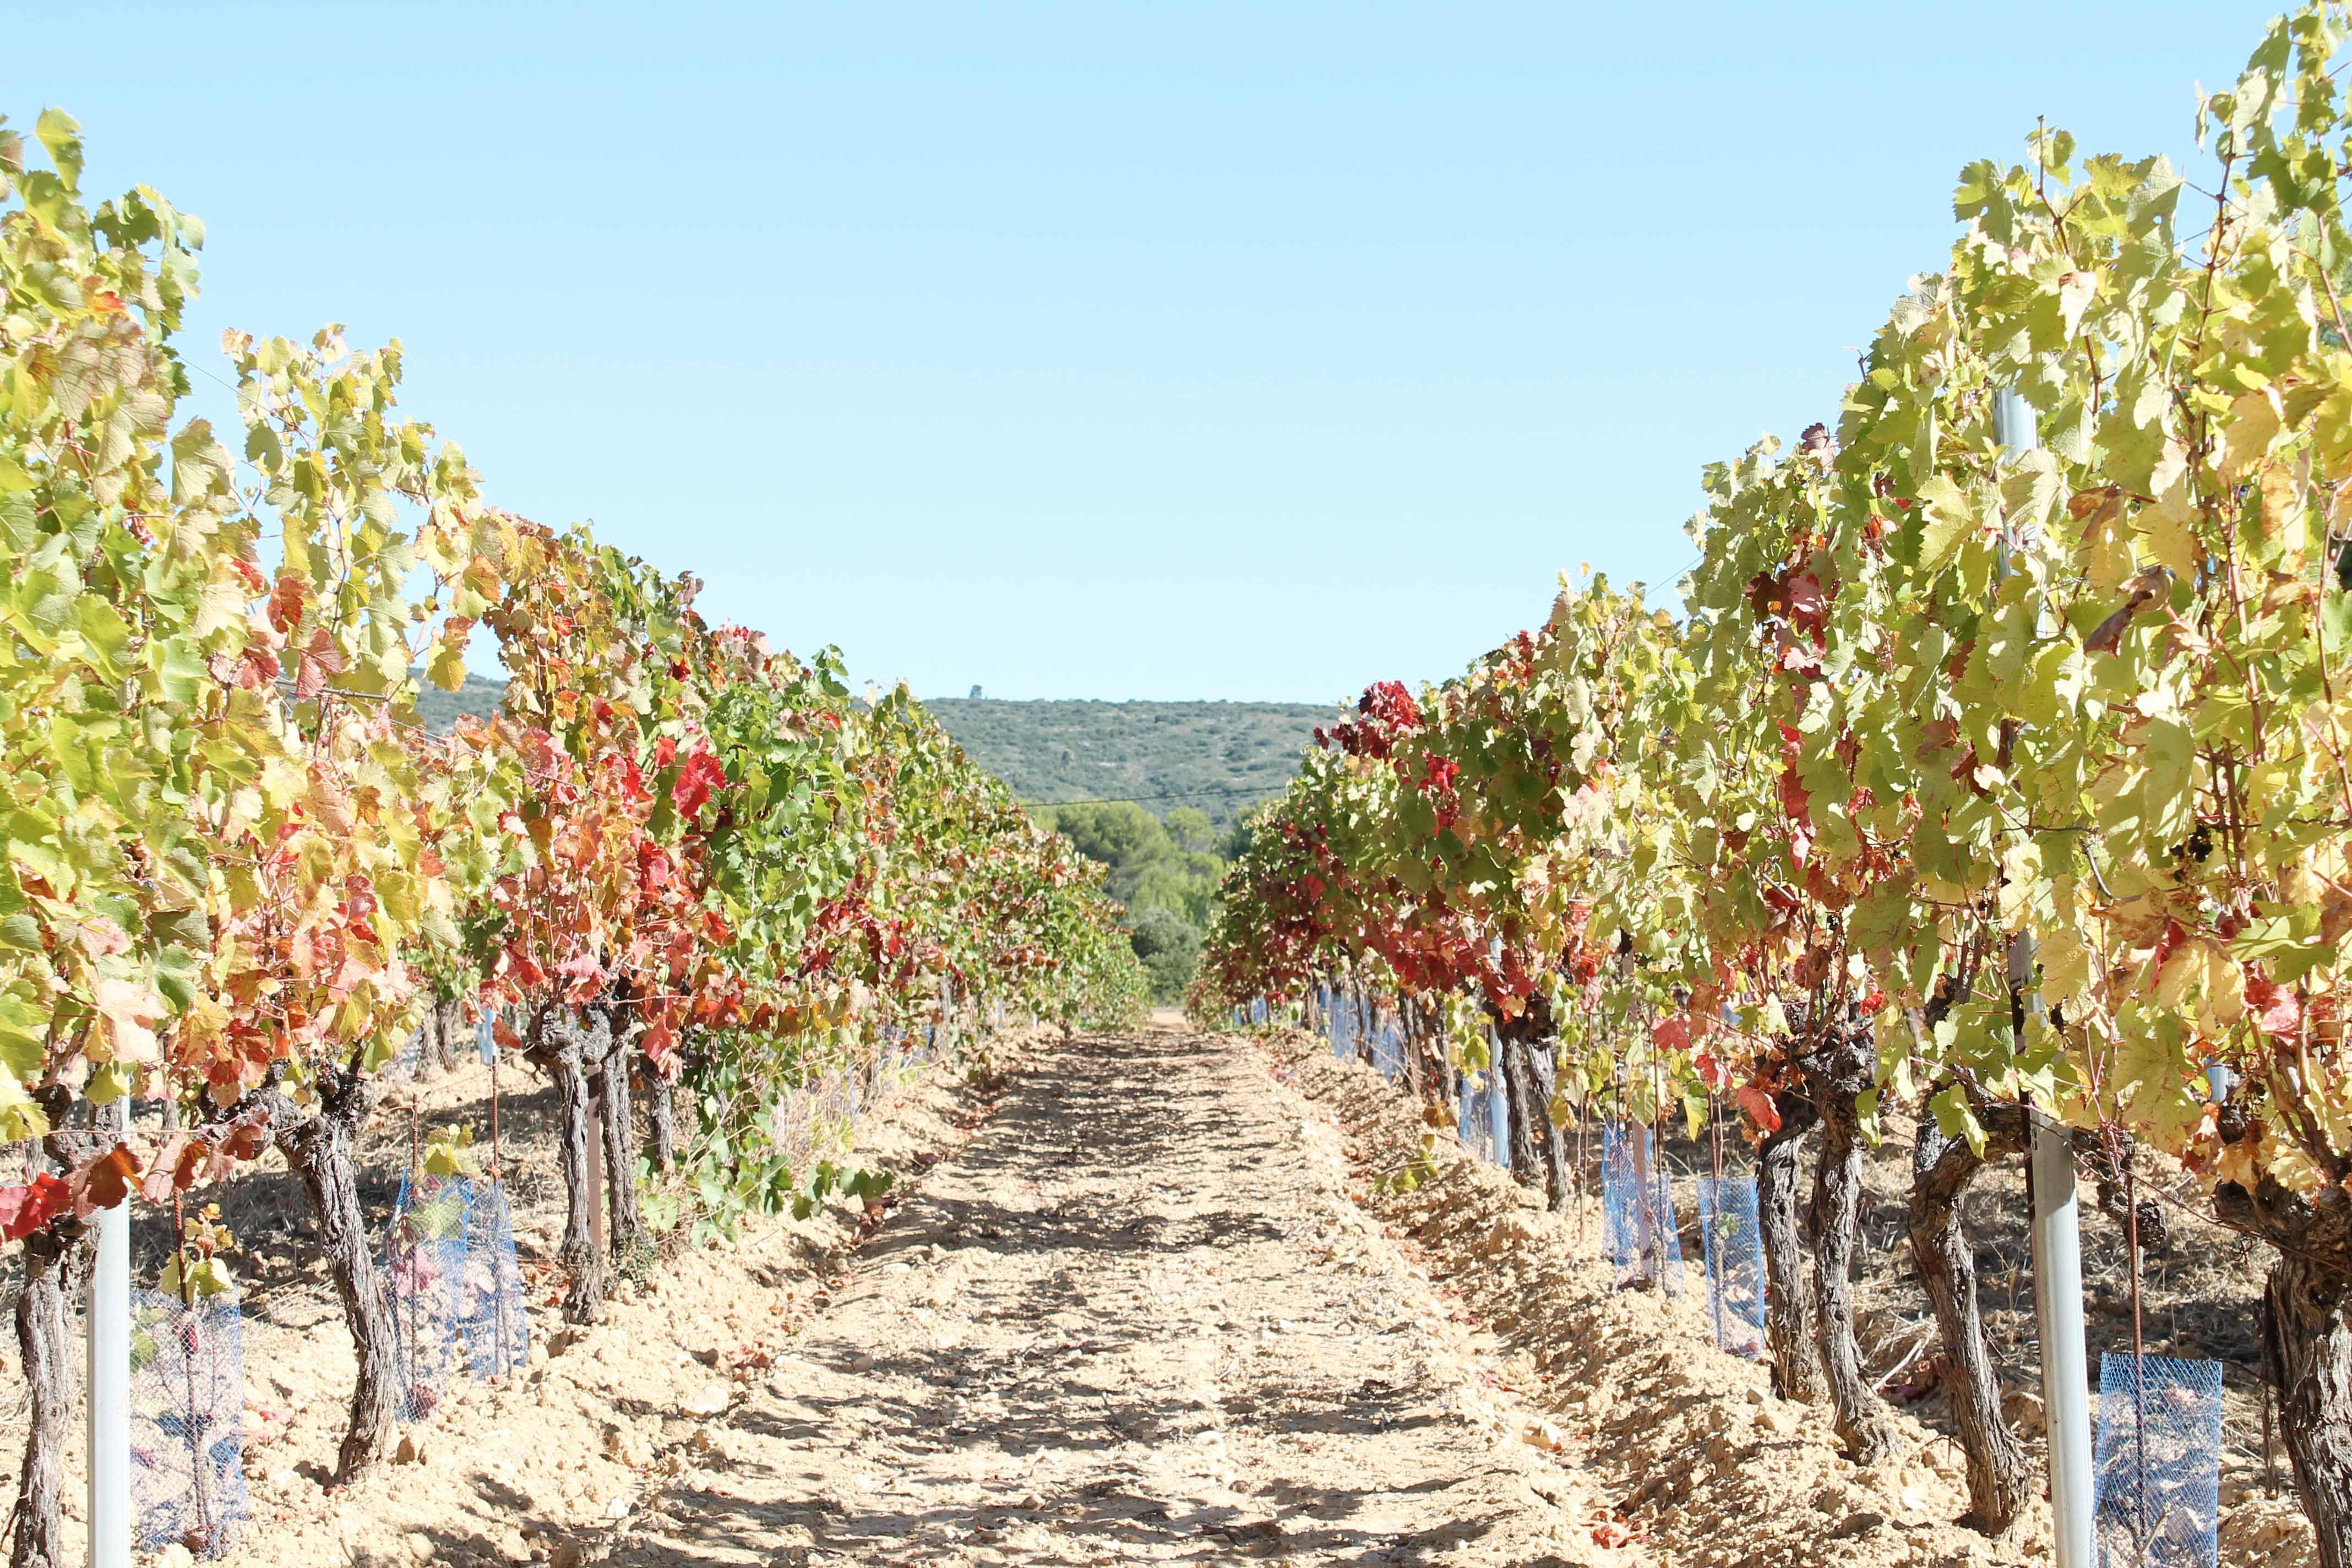 Aix en Provence wine tour, vineyard in spring